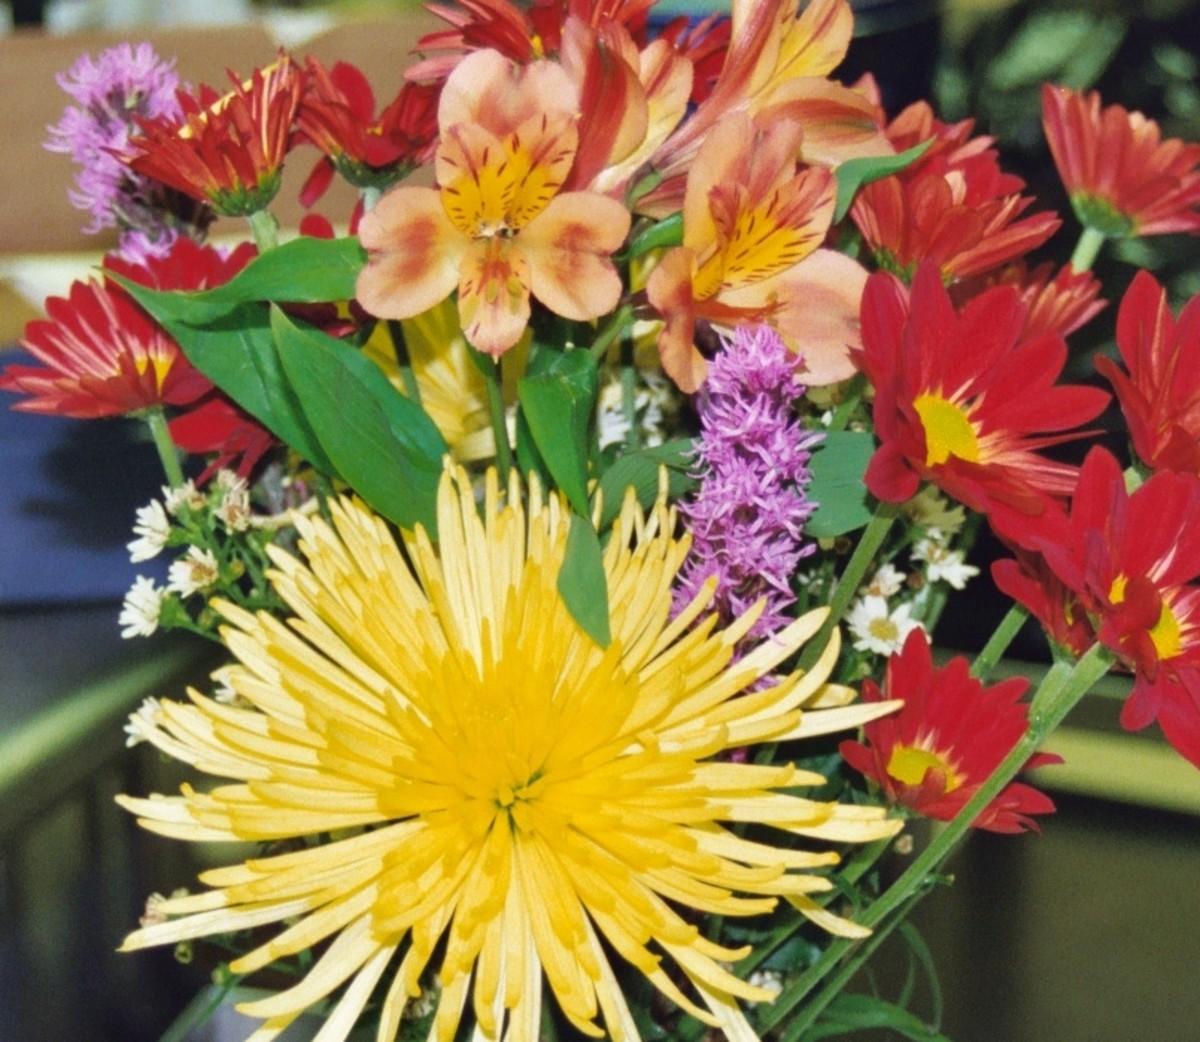 Women Celebrating Milestone Birthdays | Counting Birthday Blessings